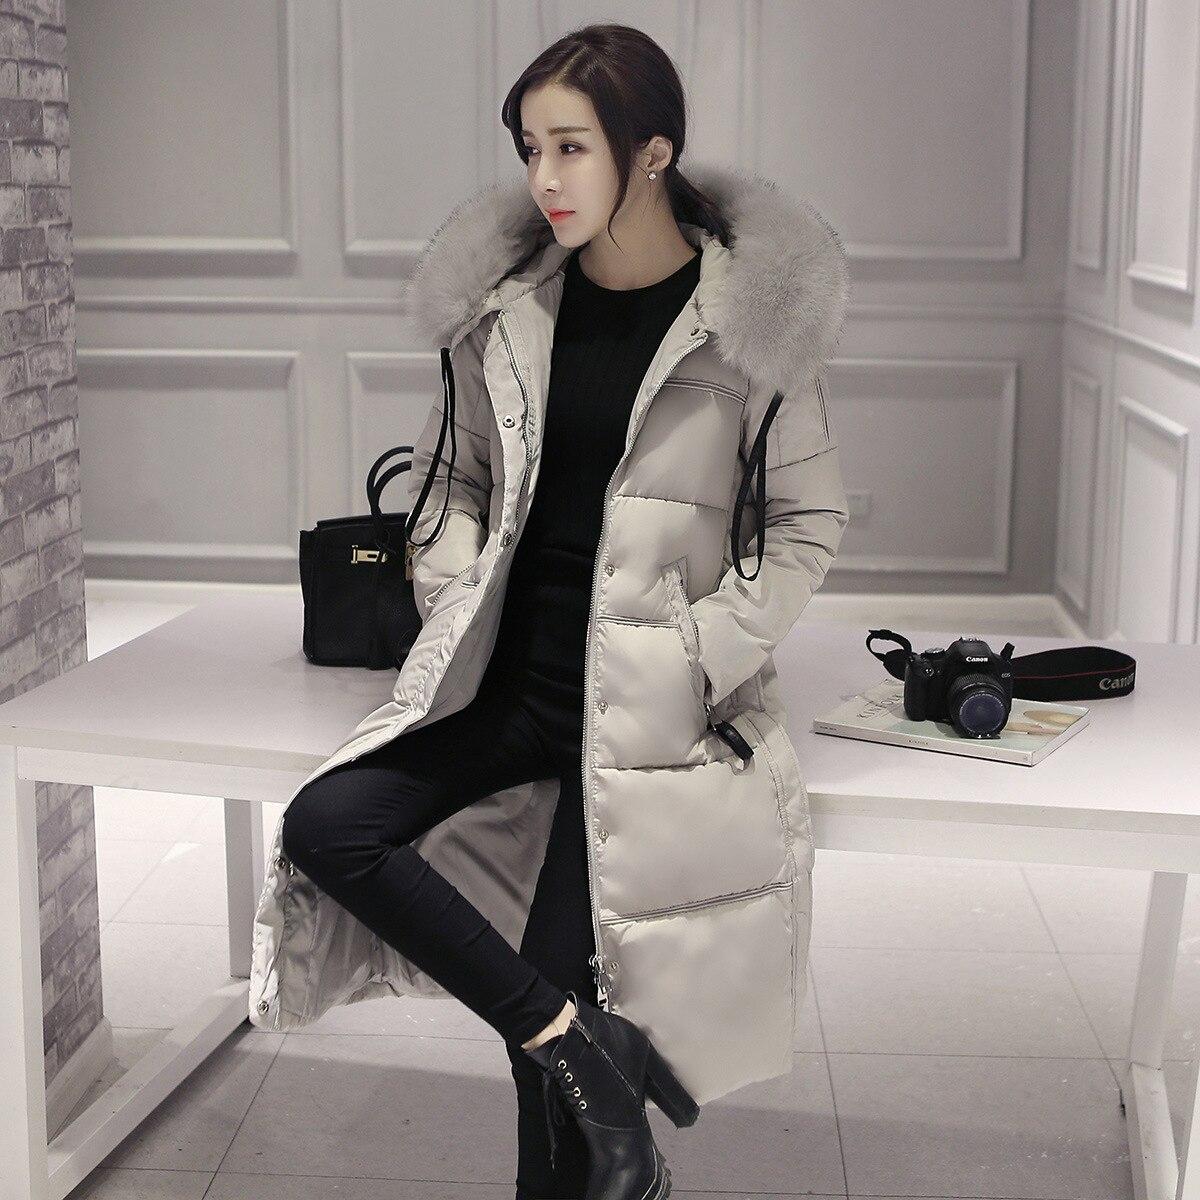 Woman Ukraine Winter Warm Windcheater Hooded Cheap Long Suit B font b Jacket b font Thick